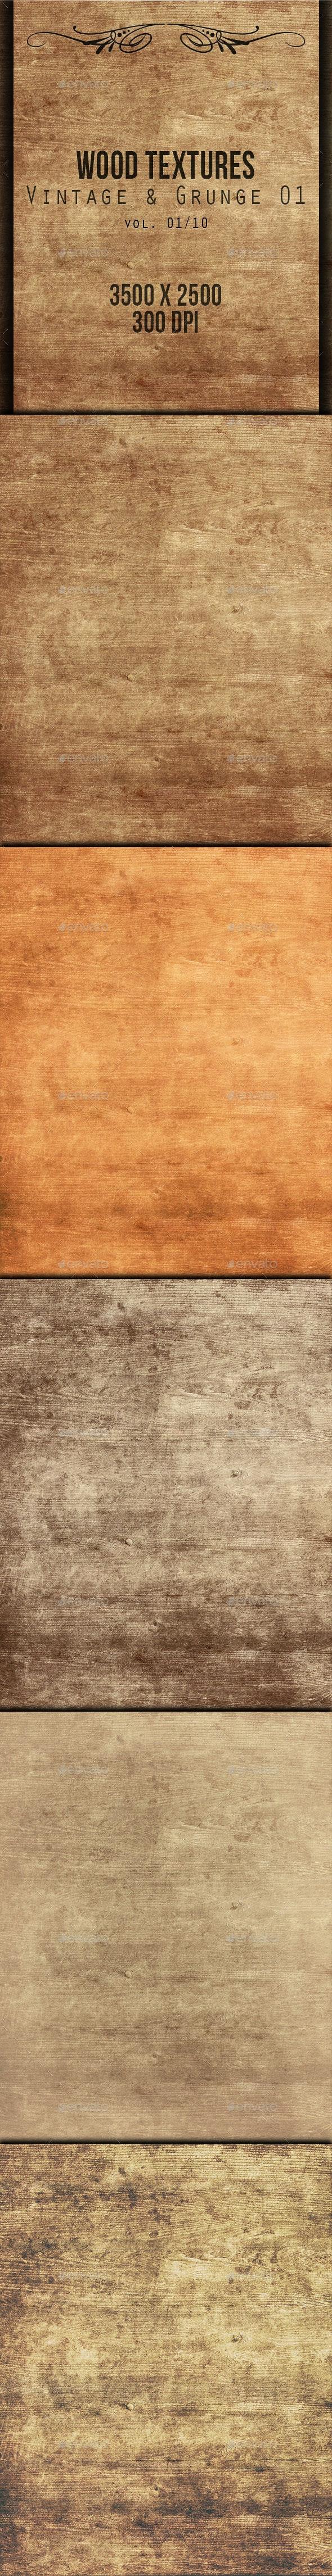 Wood Textures - Vintage & Grunge 01 vol. 01 - Wood Textures